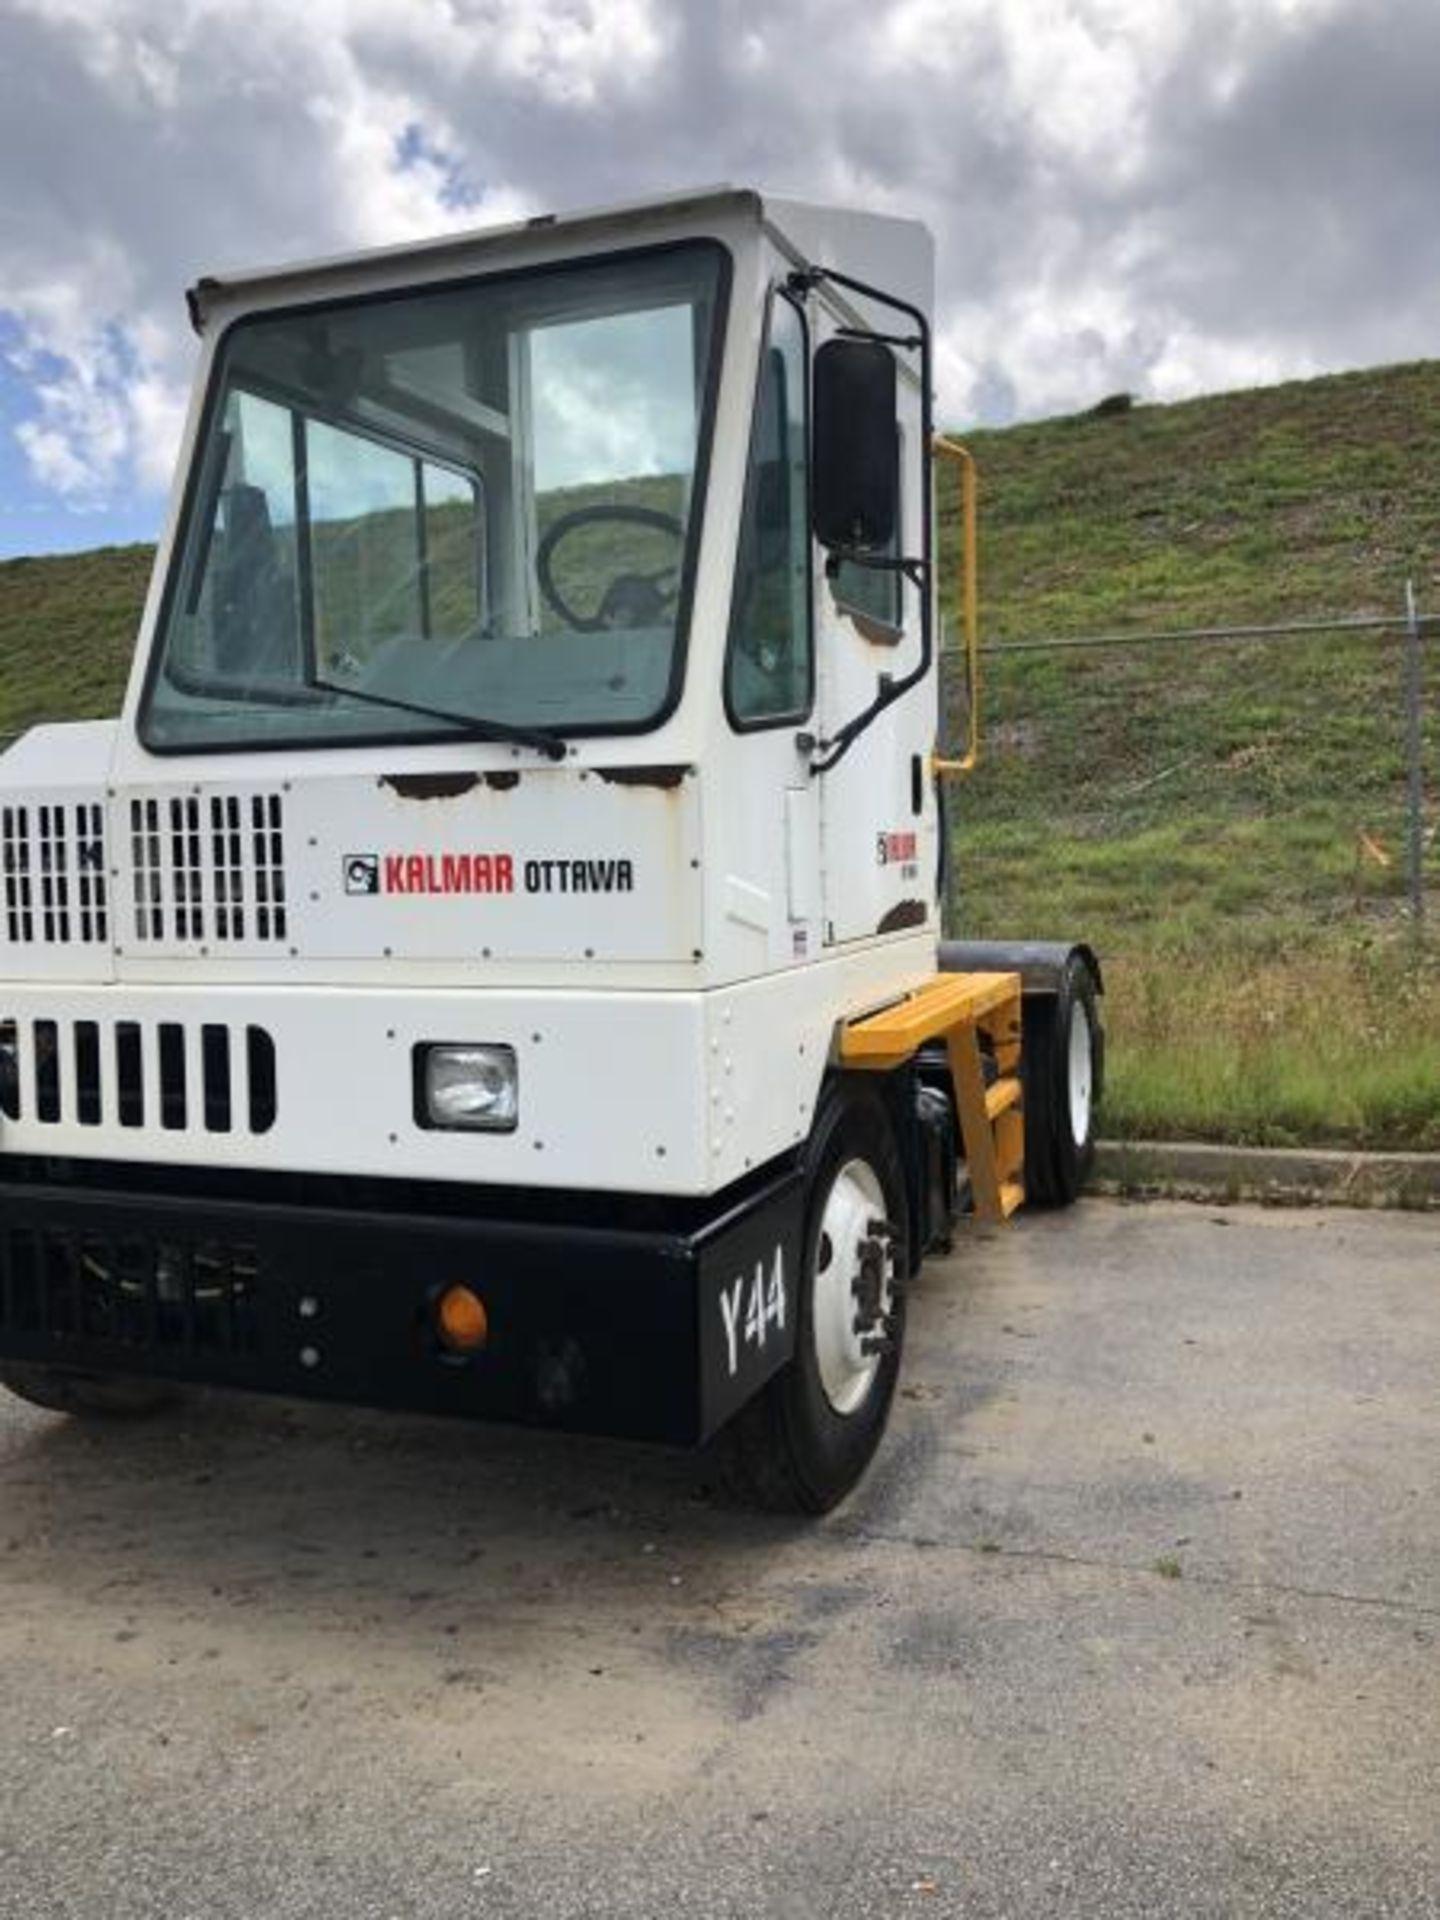 2015 Kalmar Ottawa 4x2 Yard Truck , SN: 338838 3,710.3 Hours, 2,817 Miles - Image 14 of 28